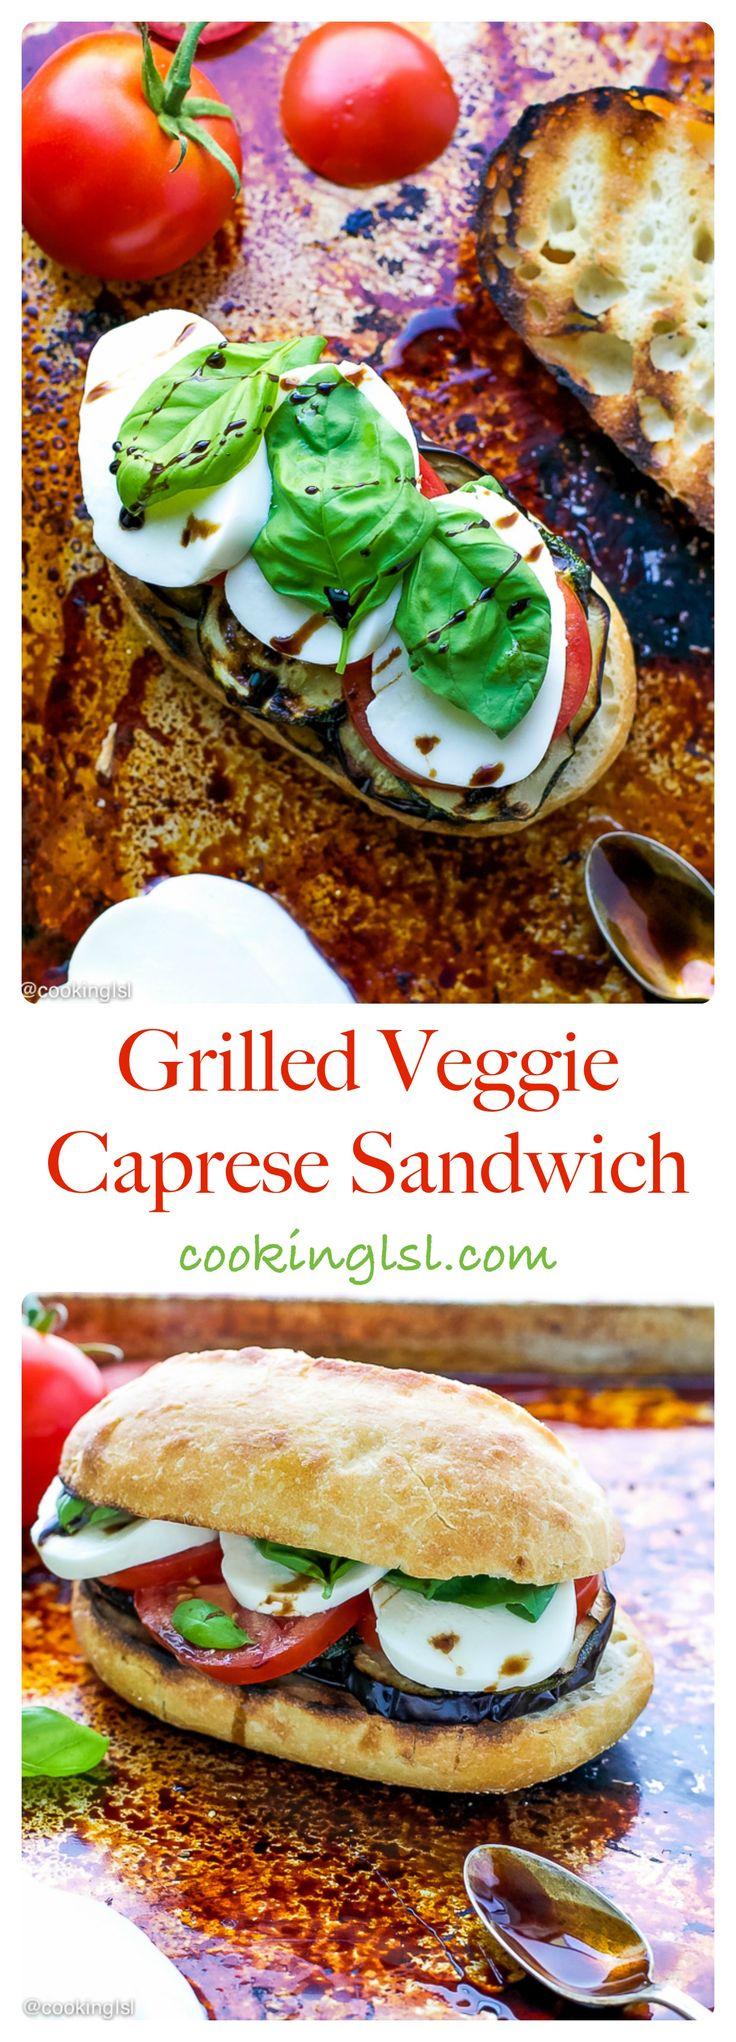 Grilled-Veggie-Caprese-Sandwich-Recipe  www.MarysLocalMarket.com Sustainable. Natural. Community. #maryslocalmarket